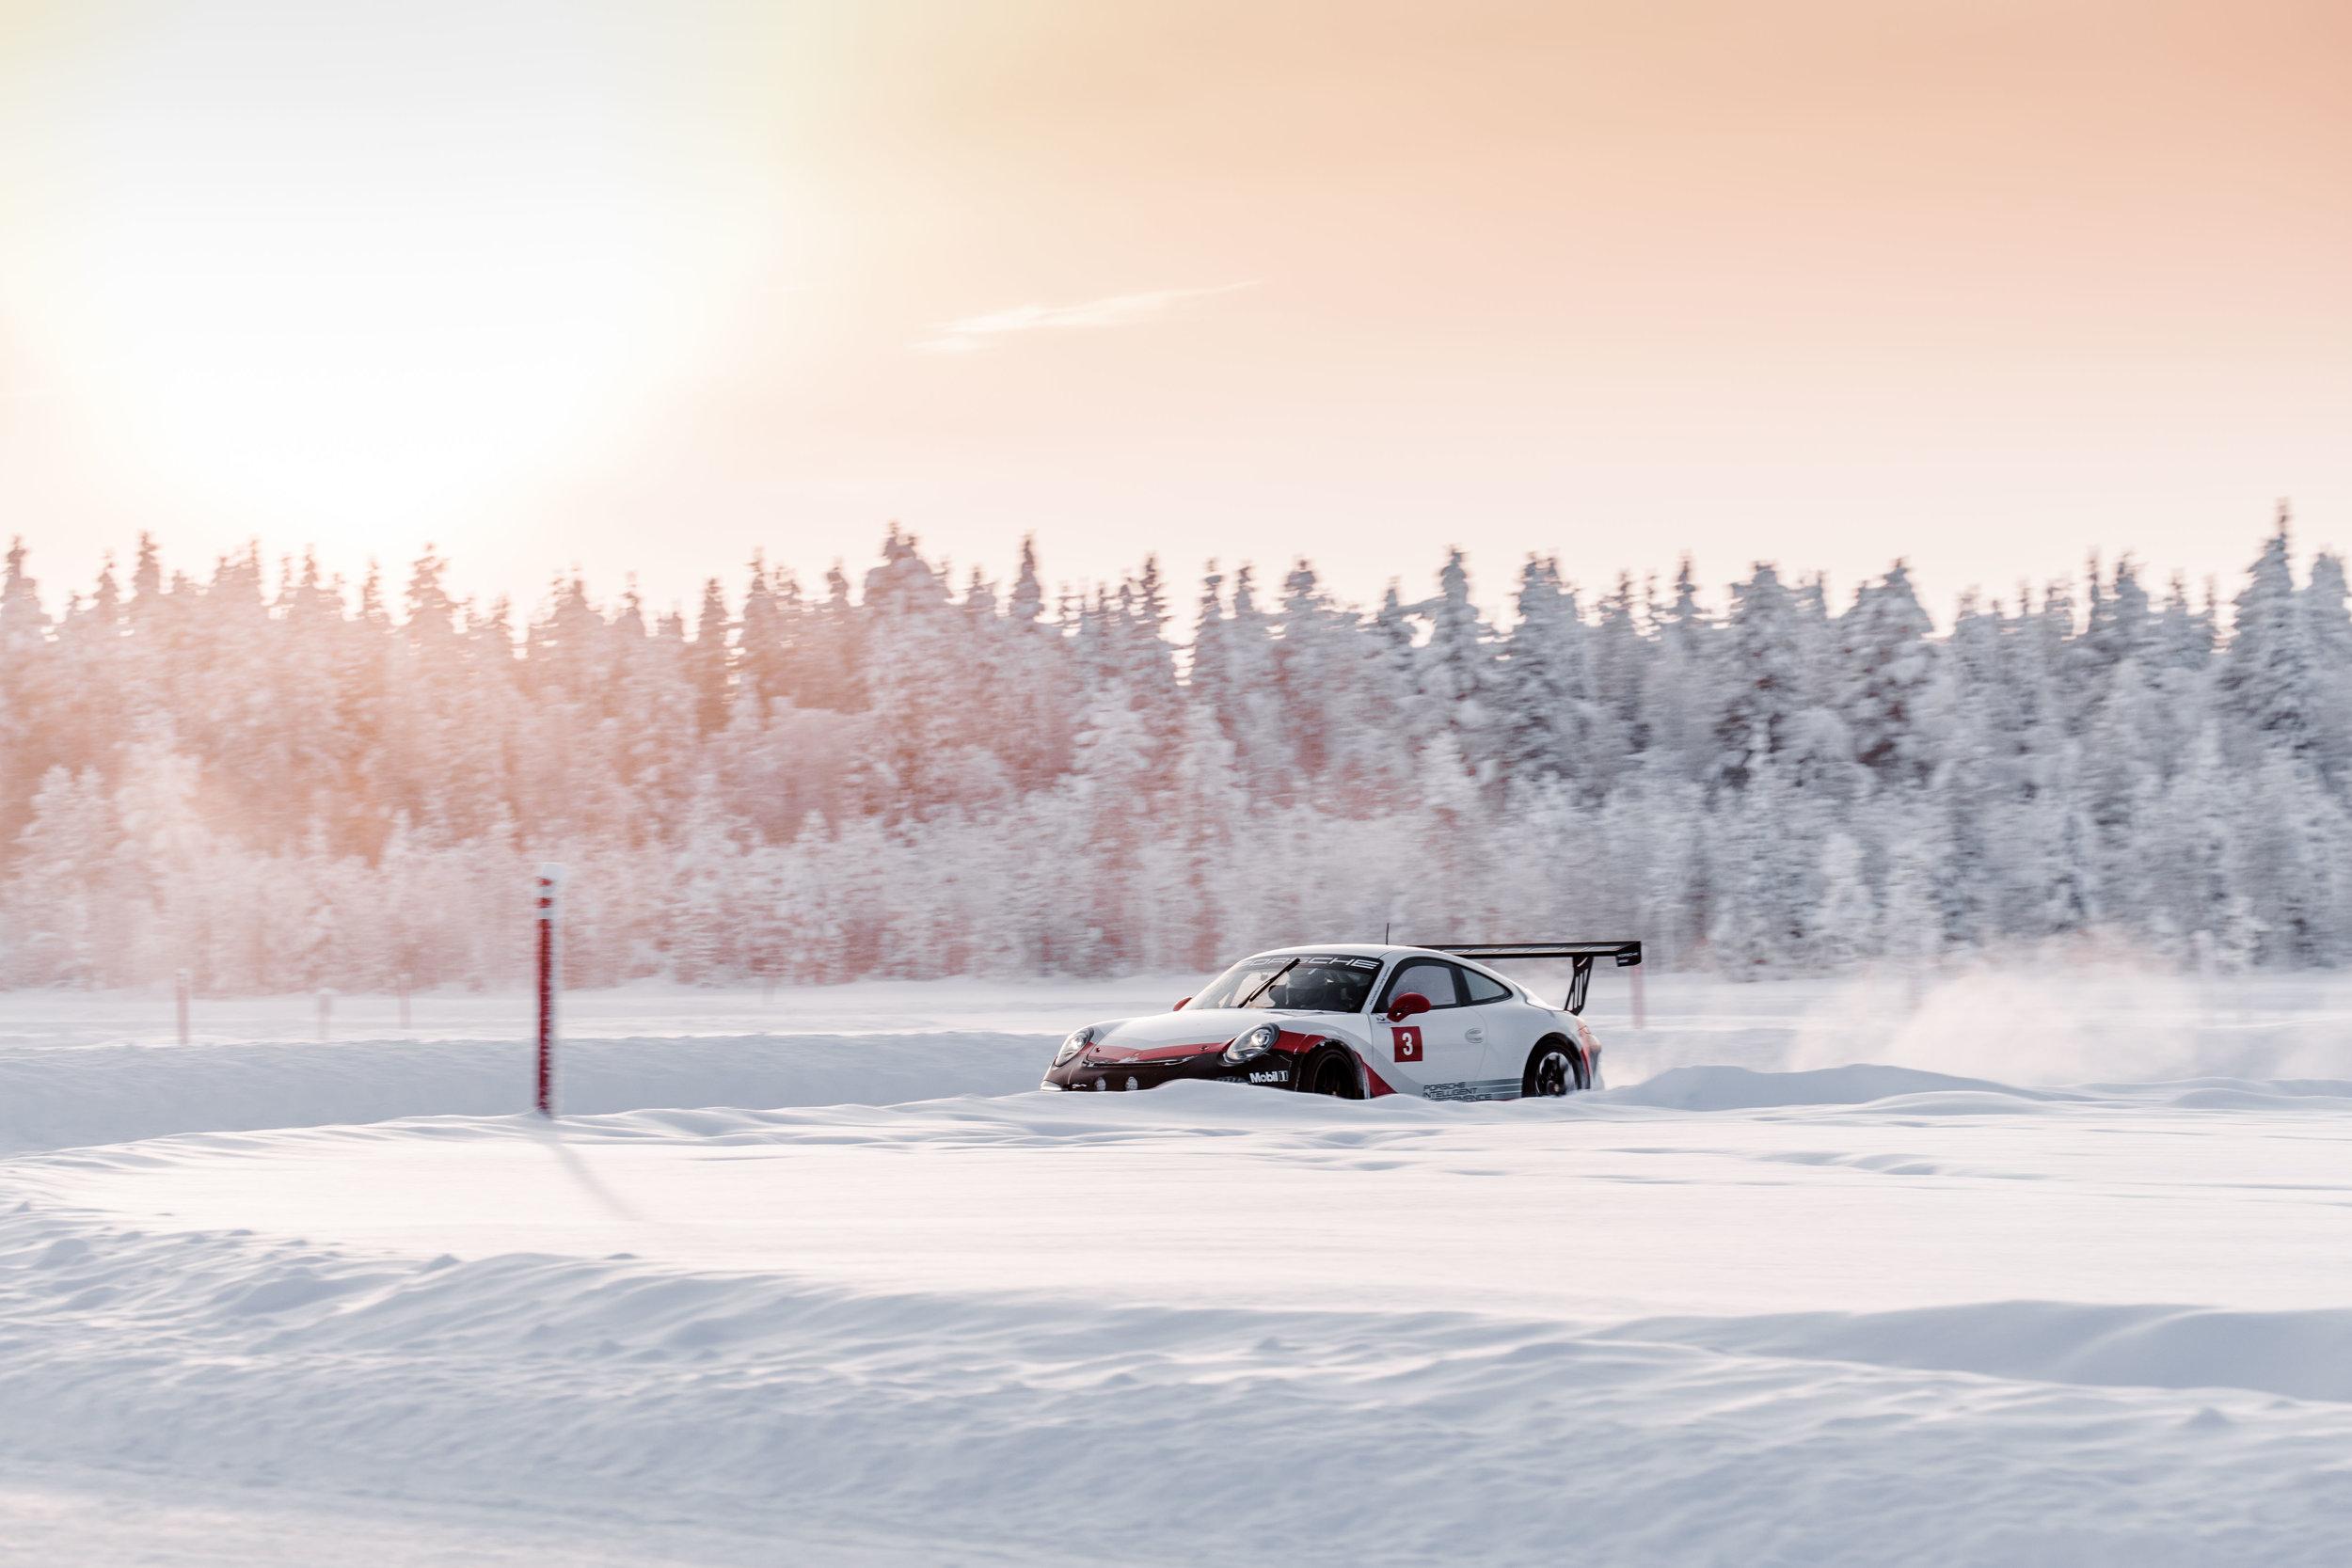 Porsche Ice Experience on Ice_30_01_2019_1696_175864.jpg